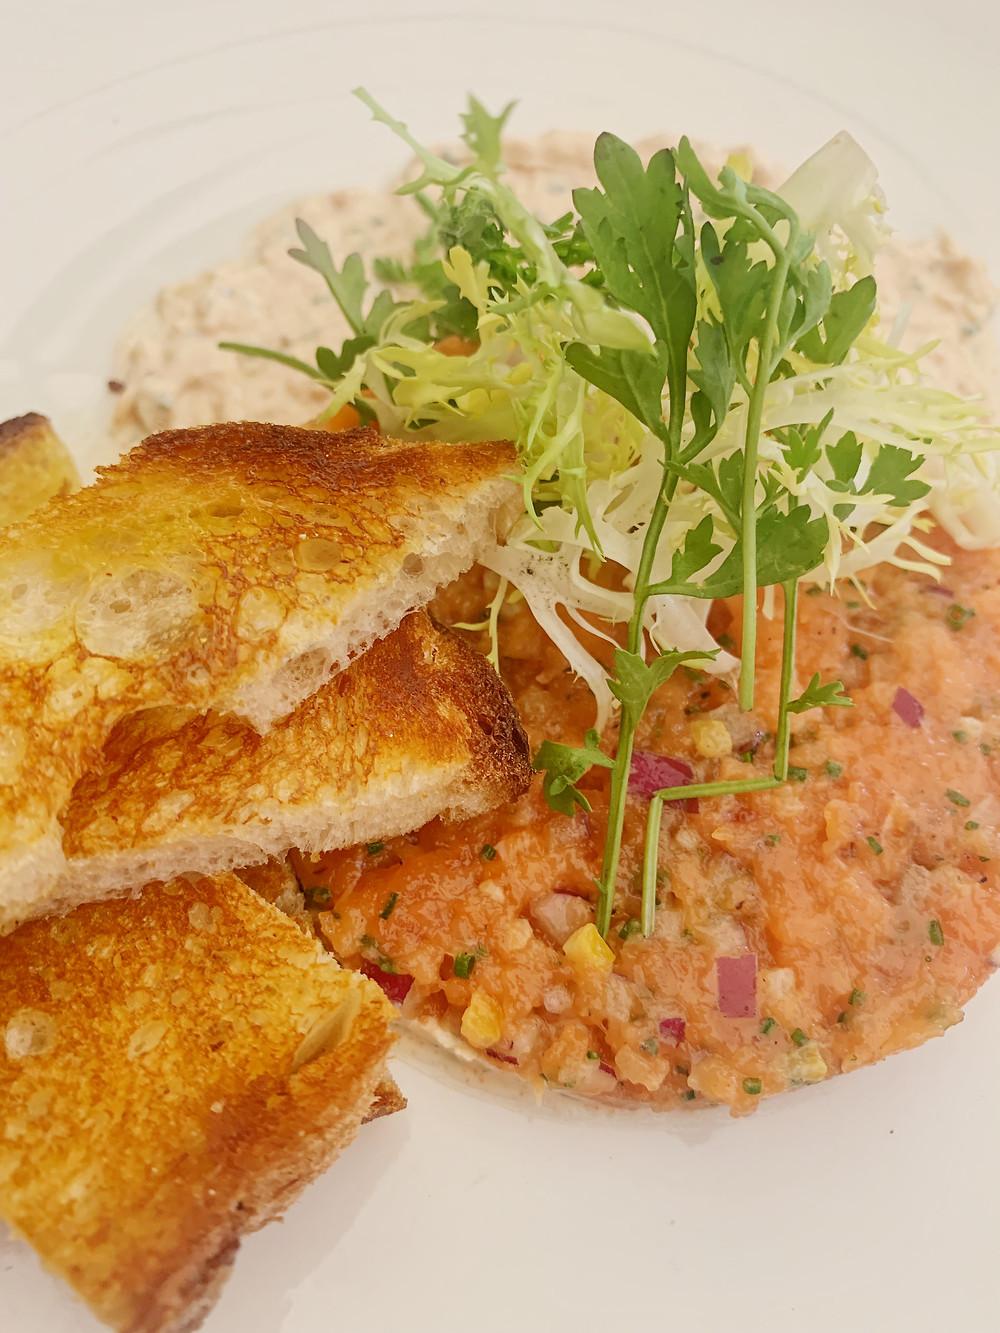 king salmon tartare preserved meyer lemon, pepper cress, frisée, smoked paprika tzatziki, crostini